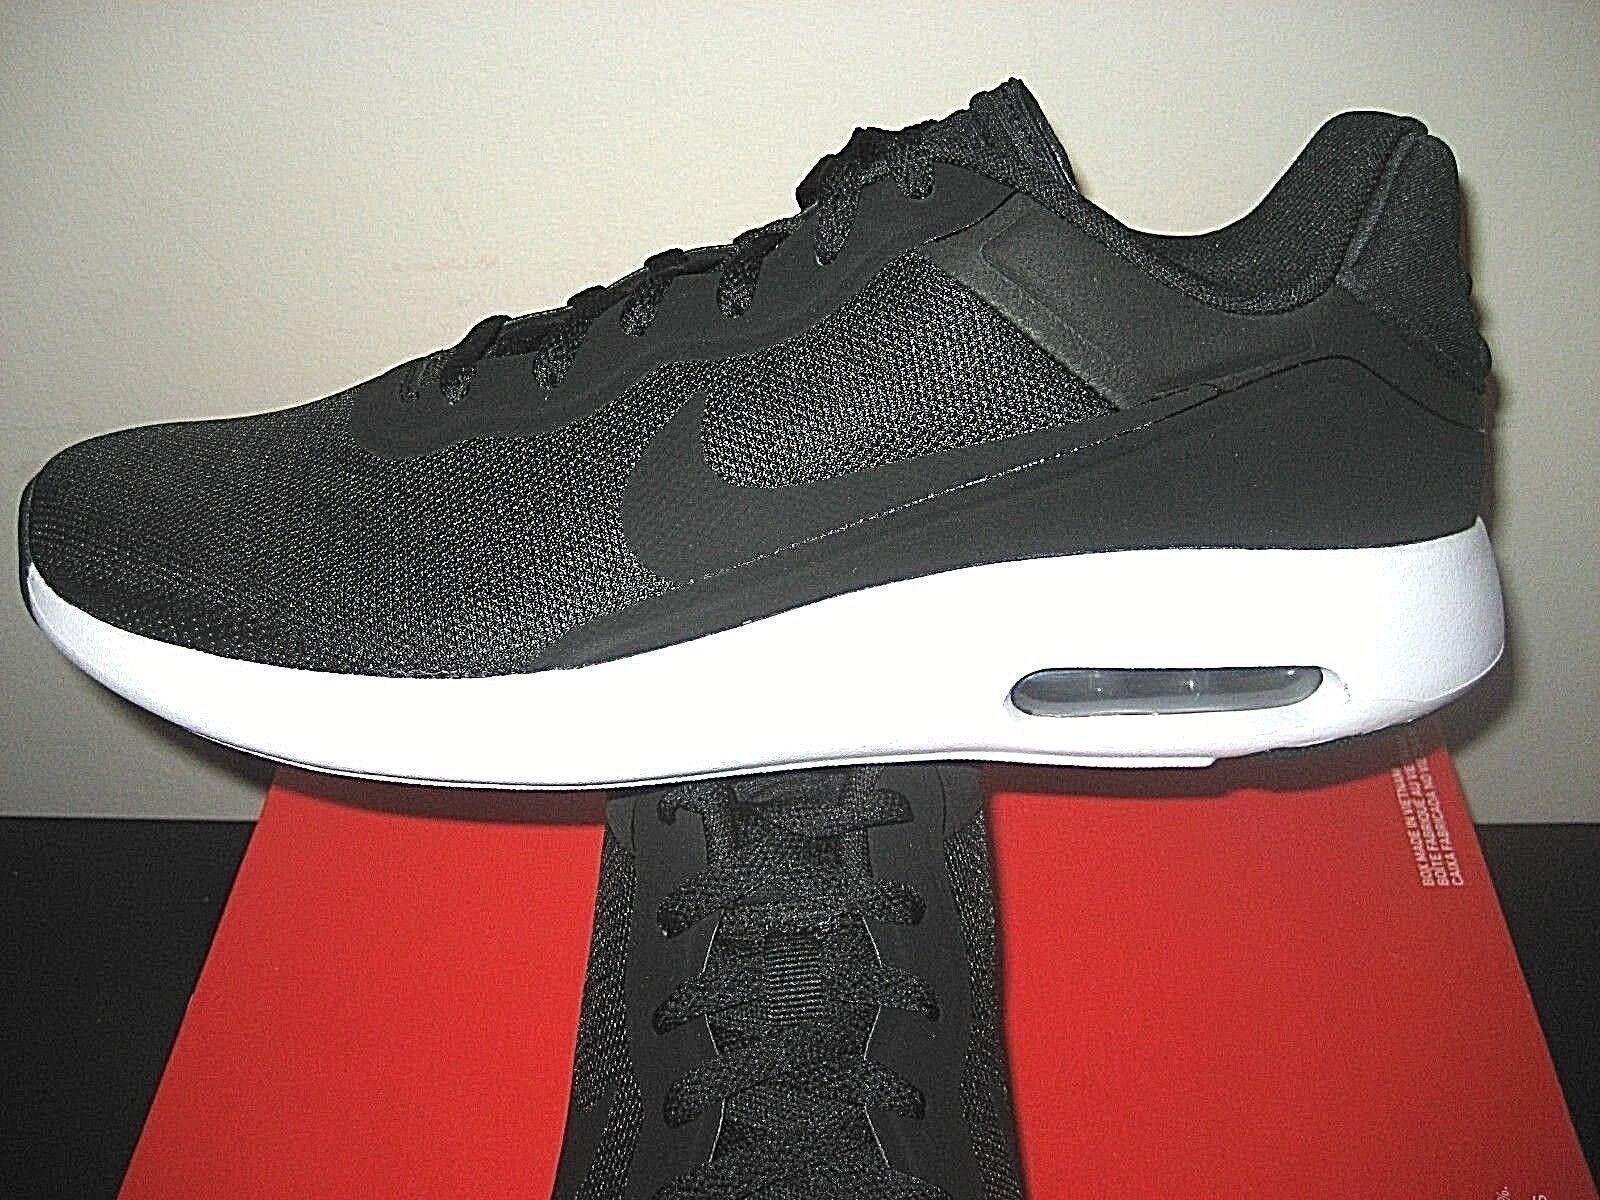 d80f8744143 Nike Air Max Lebron Lebron Lebron 9 Black And Red (Heat) a24e33 ...